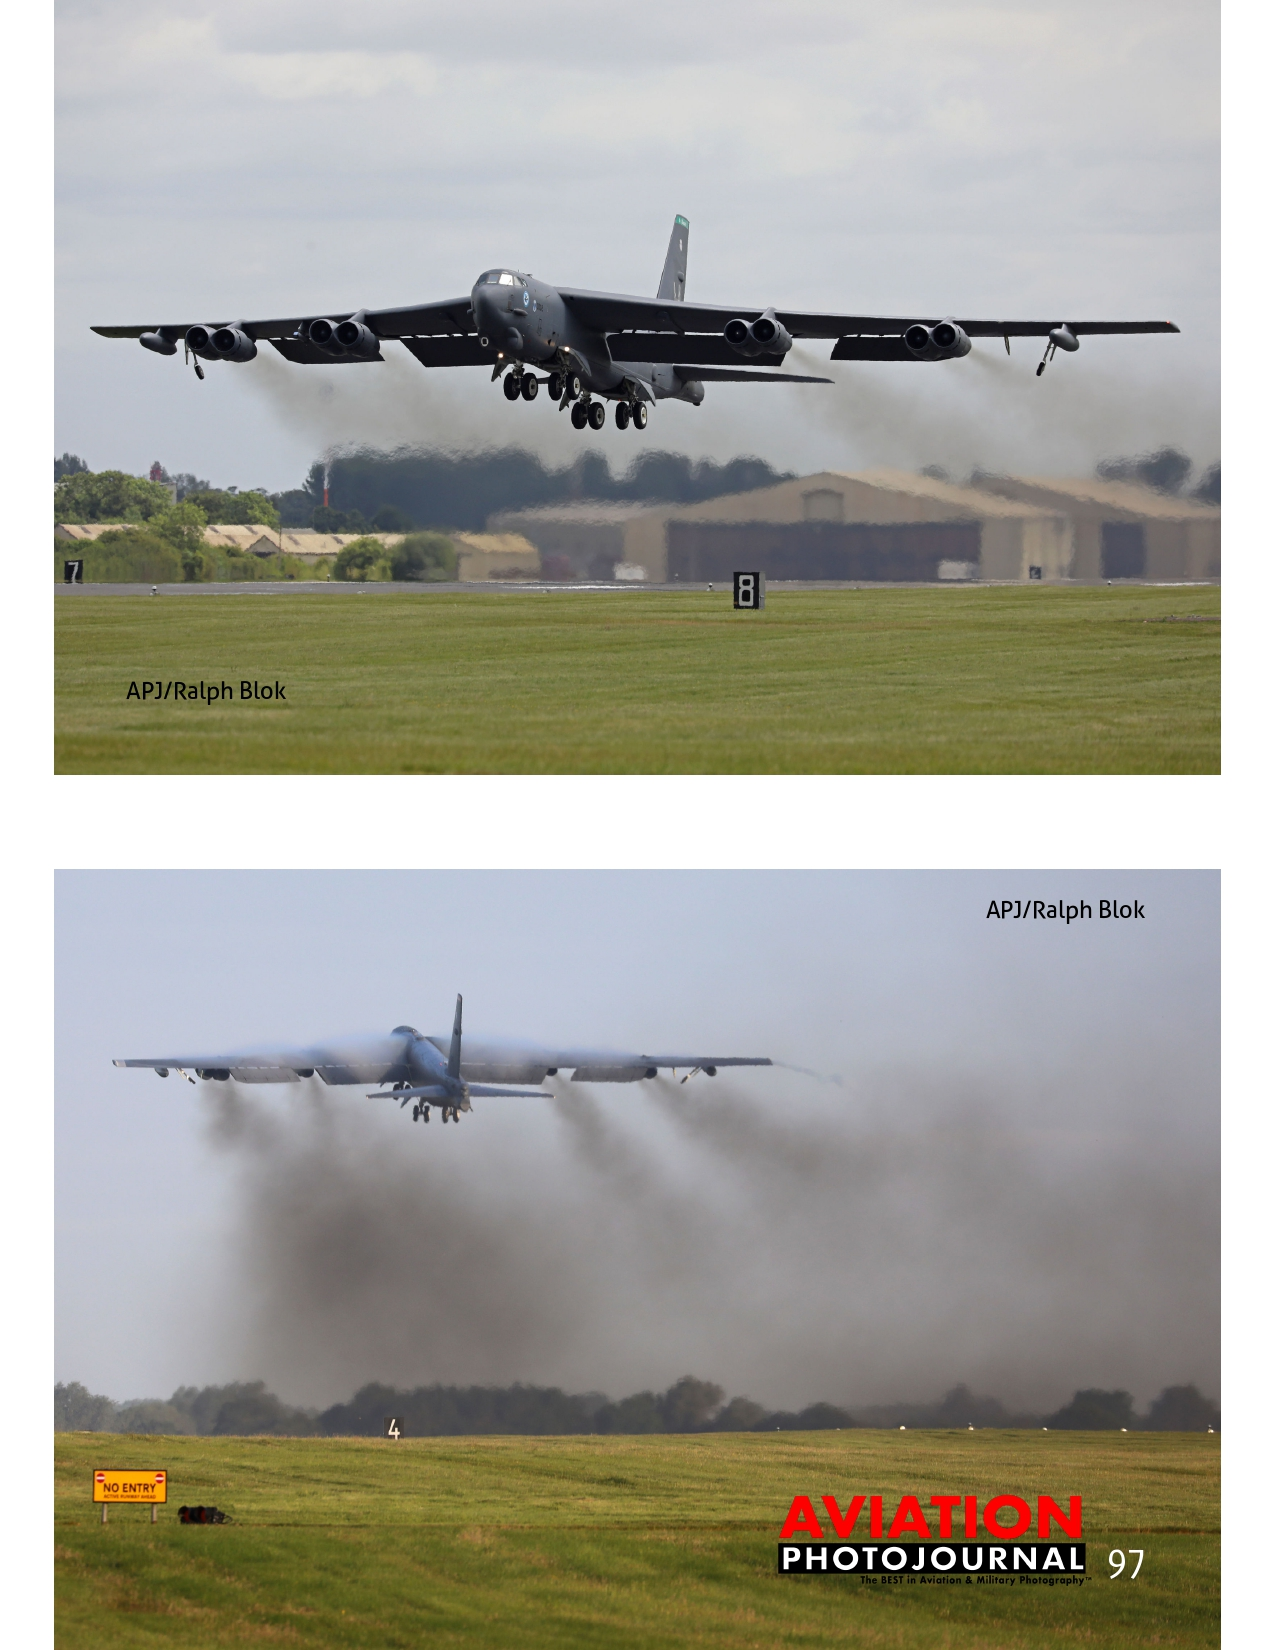 Aviation+Photojournal+January+-+April+2018-3_page-0097